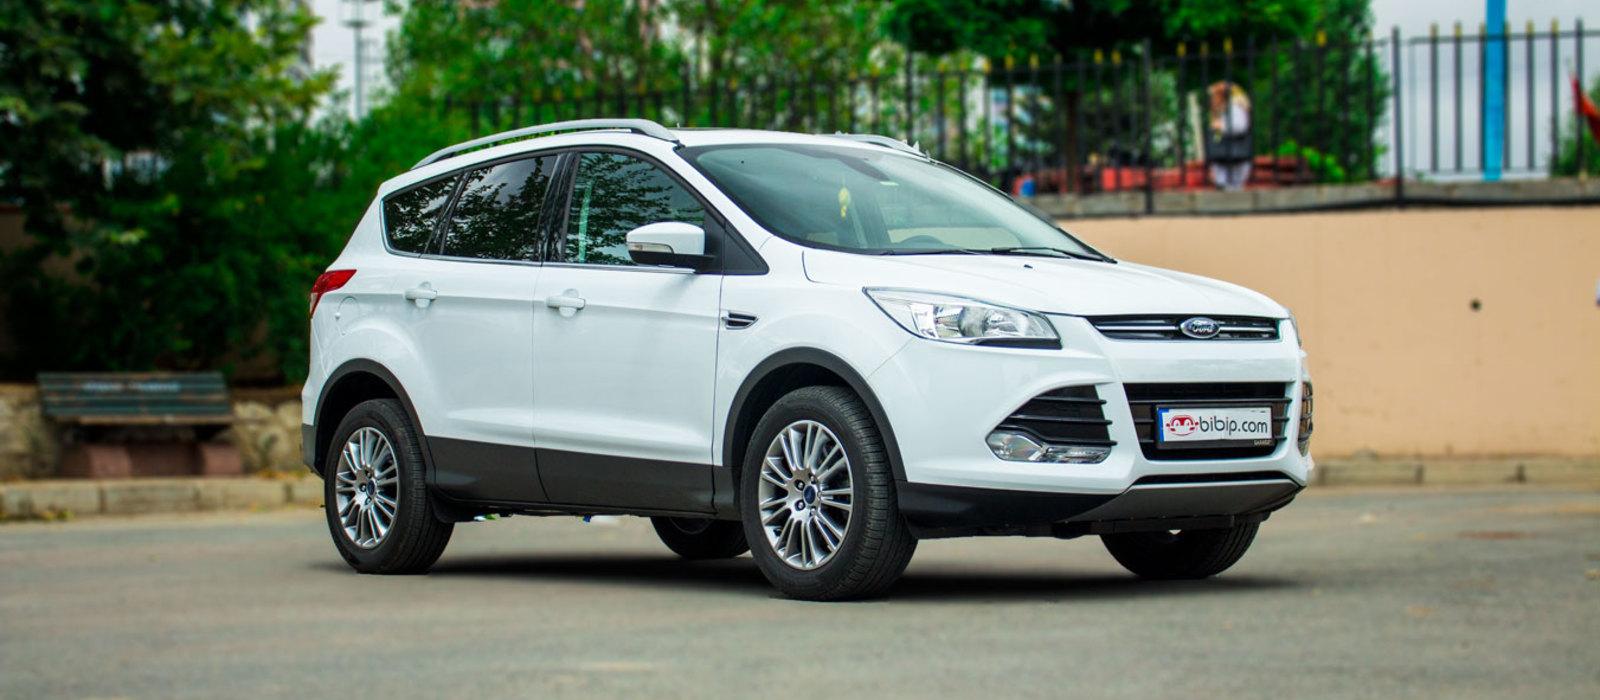 ikinci el araba 2014 Ford Kuga 1.6 EcoBoost Titanium Benzin Otomatik 14000 KM 7